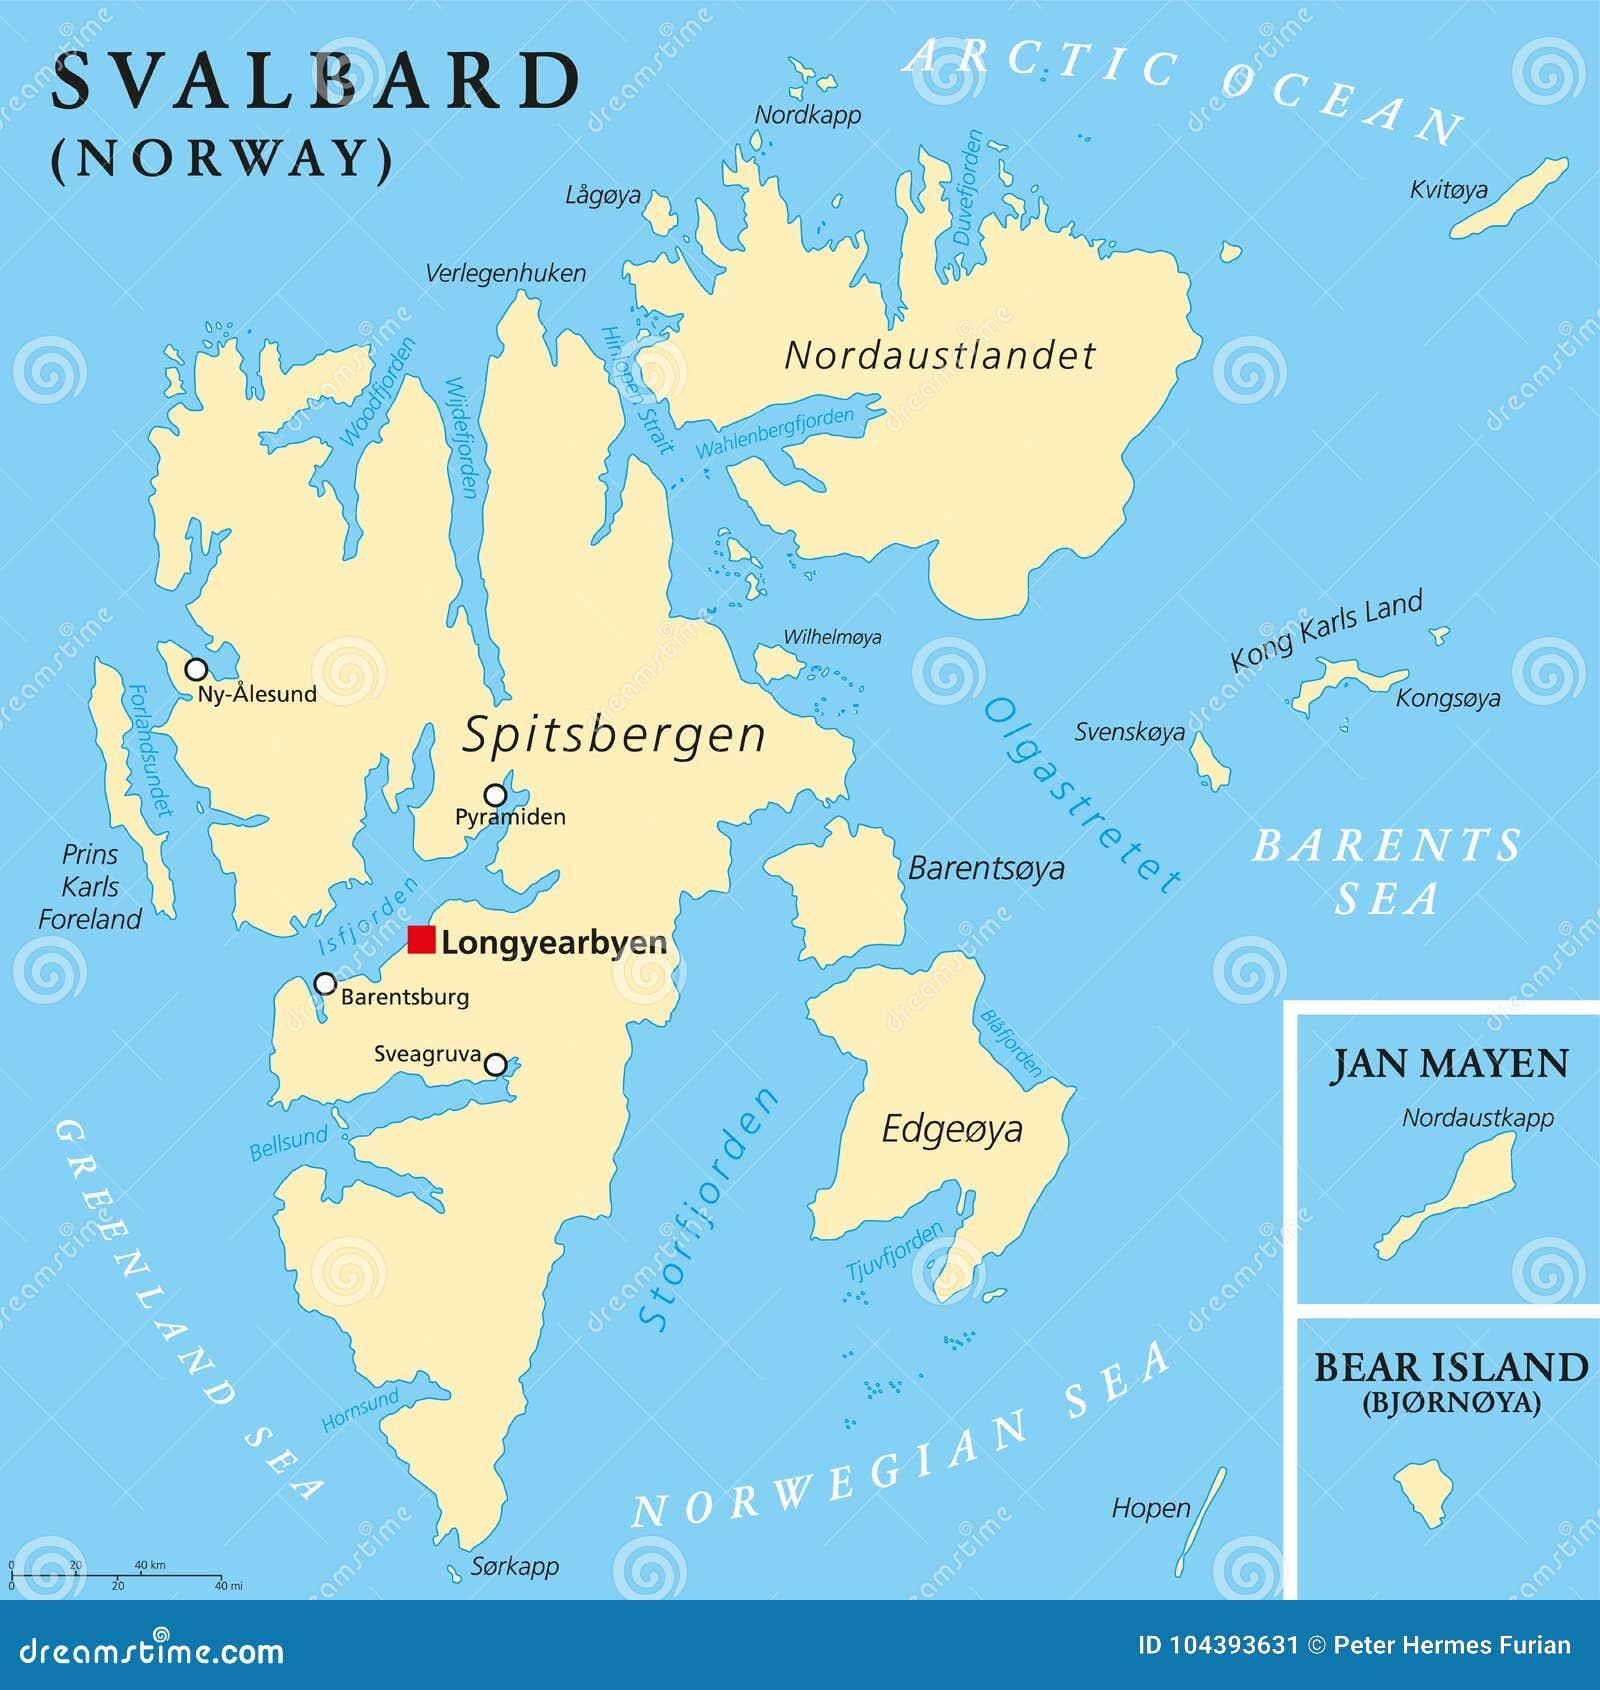 Svalbard Political Map Stock Vector Illustration Of Mayen